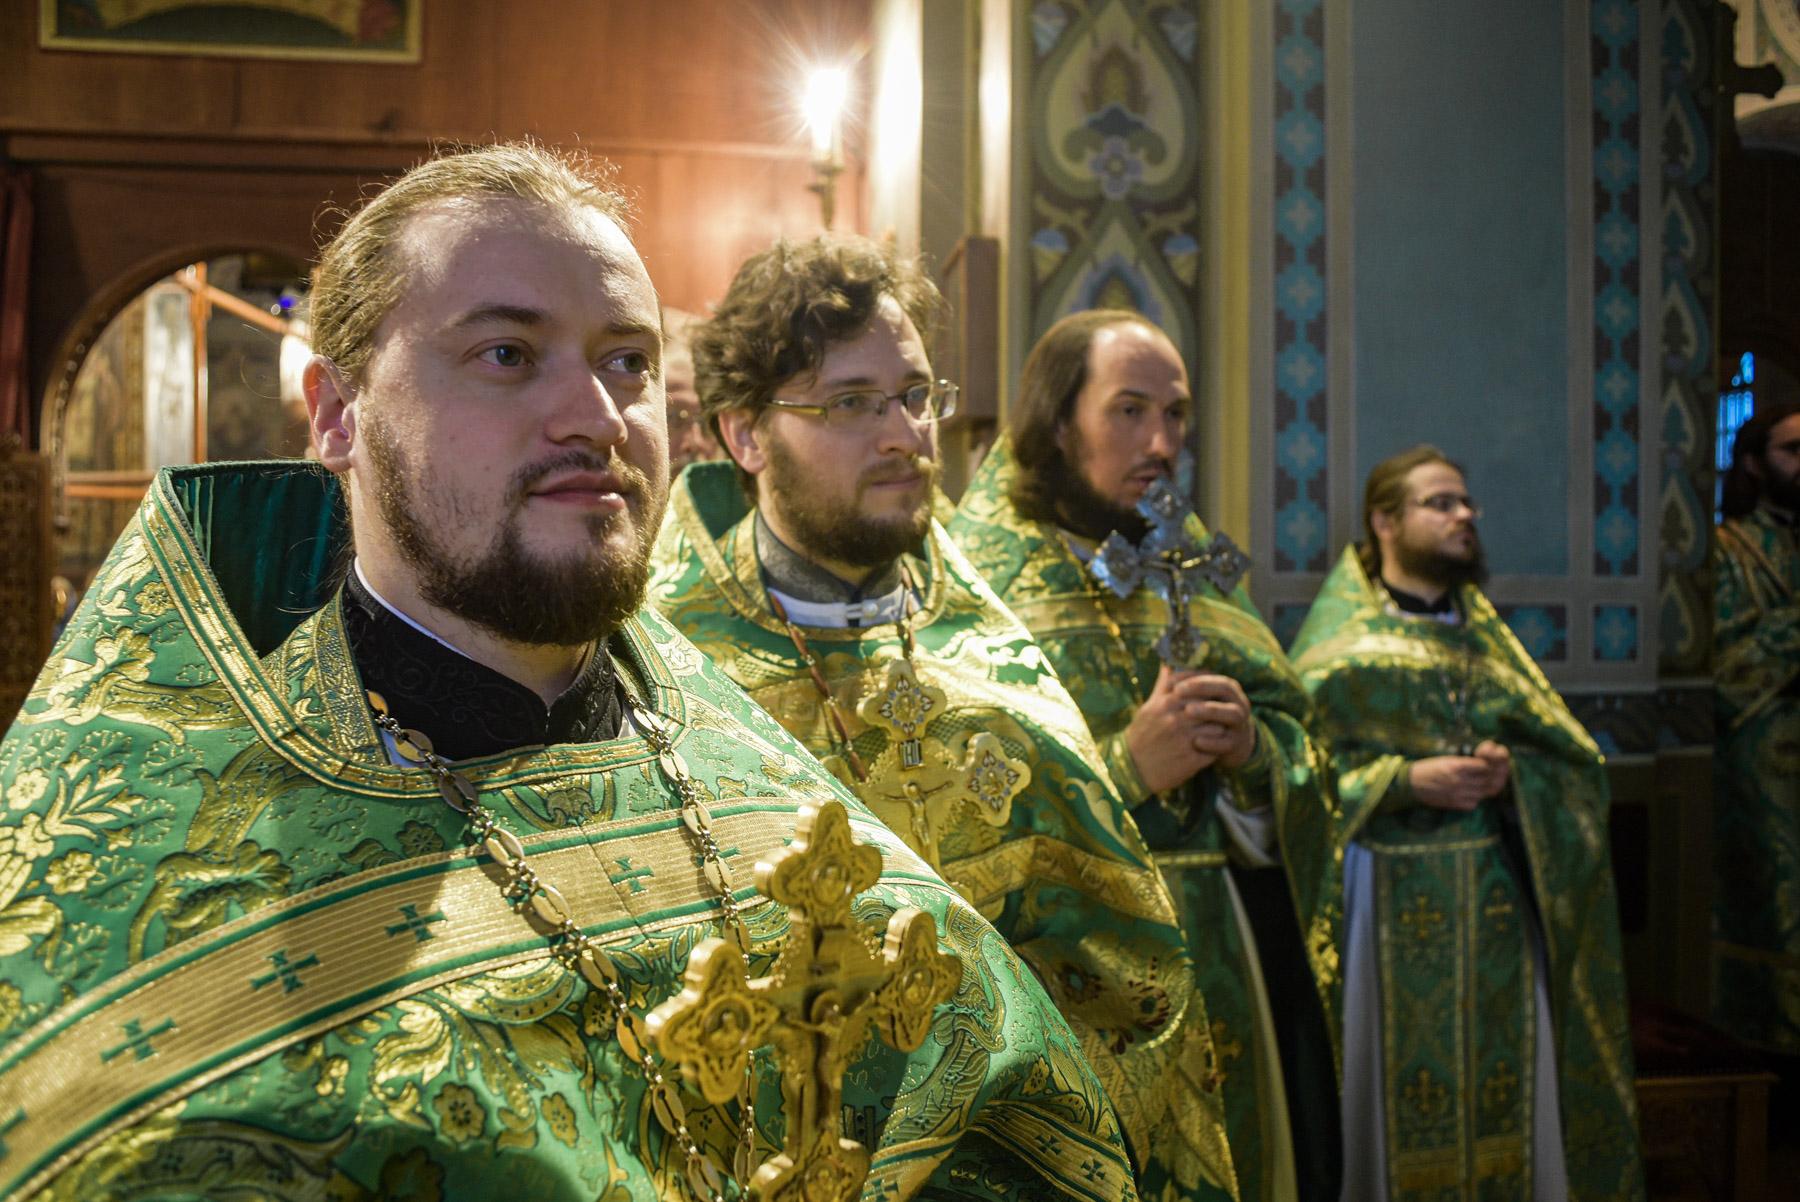 photos of orthodox christmas 0161 2